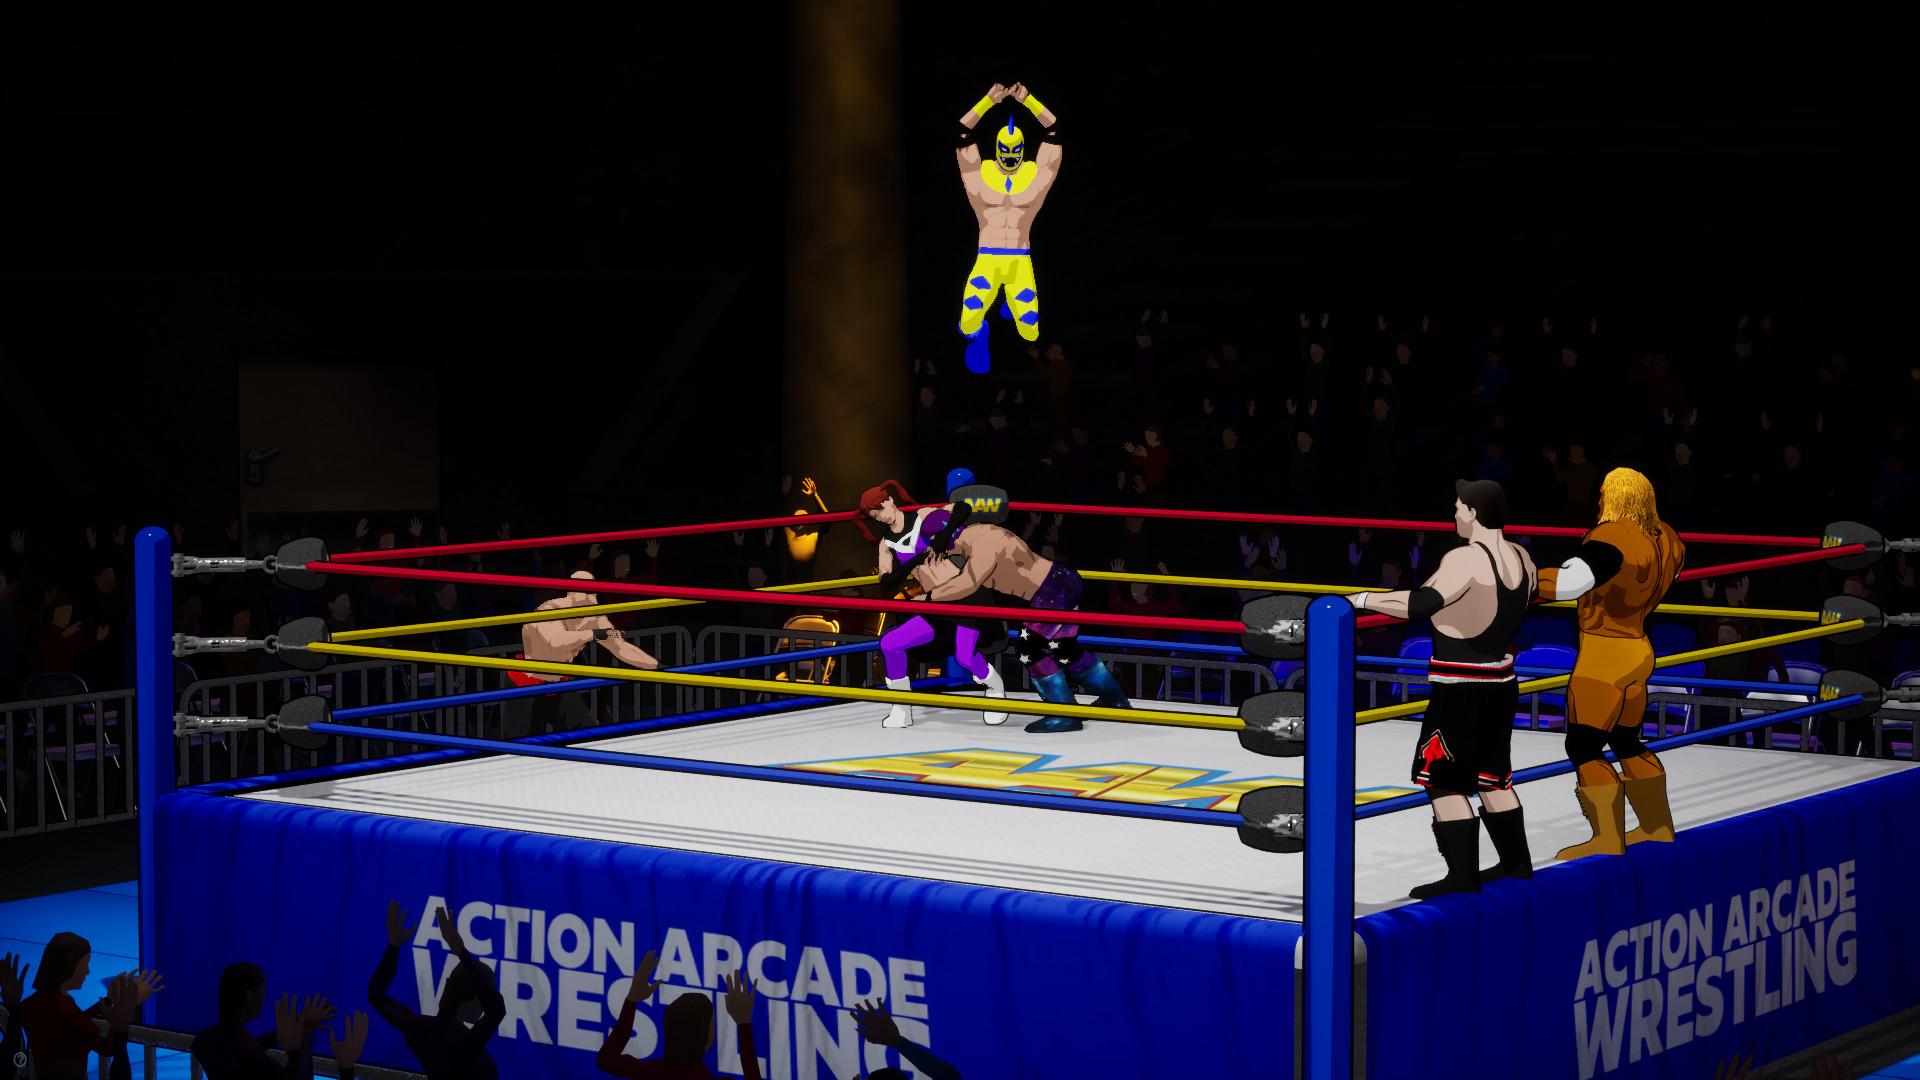 action arcade wrestling